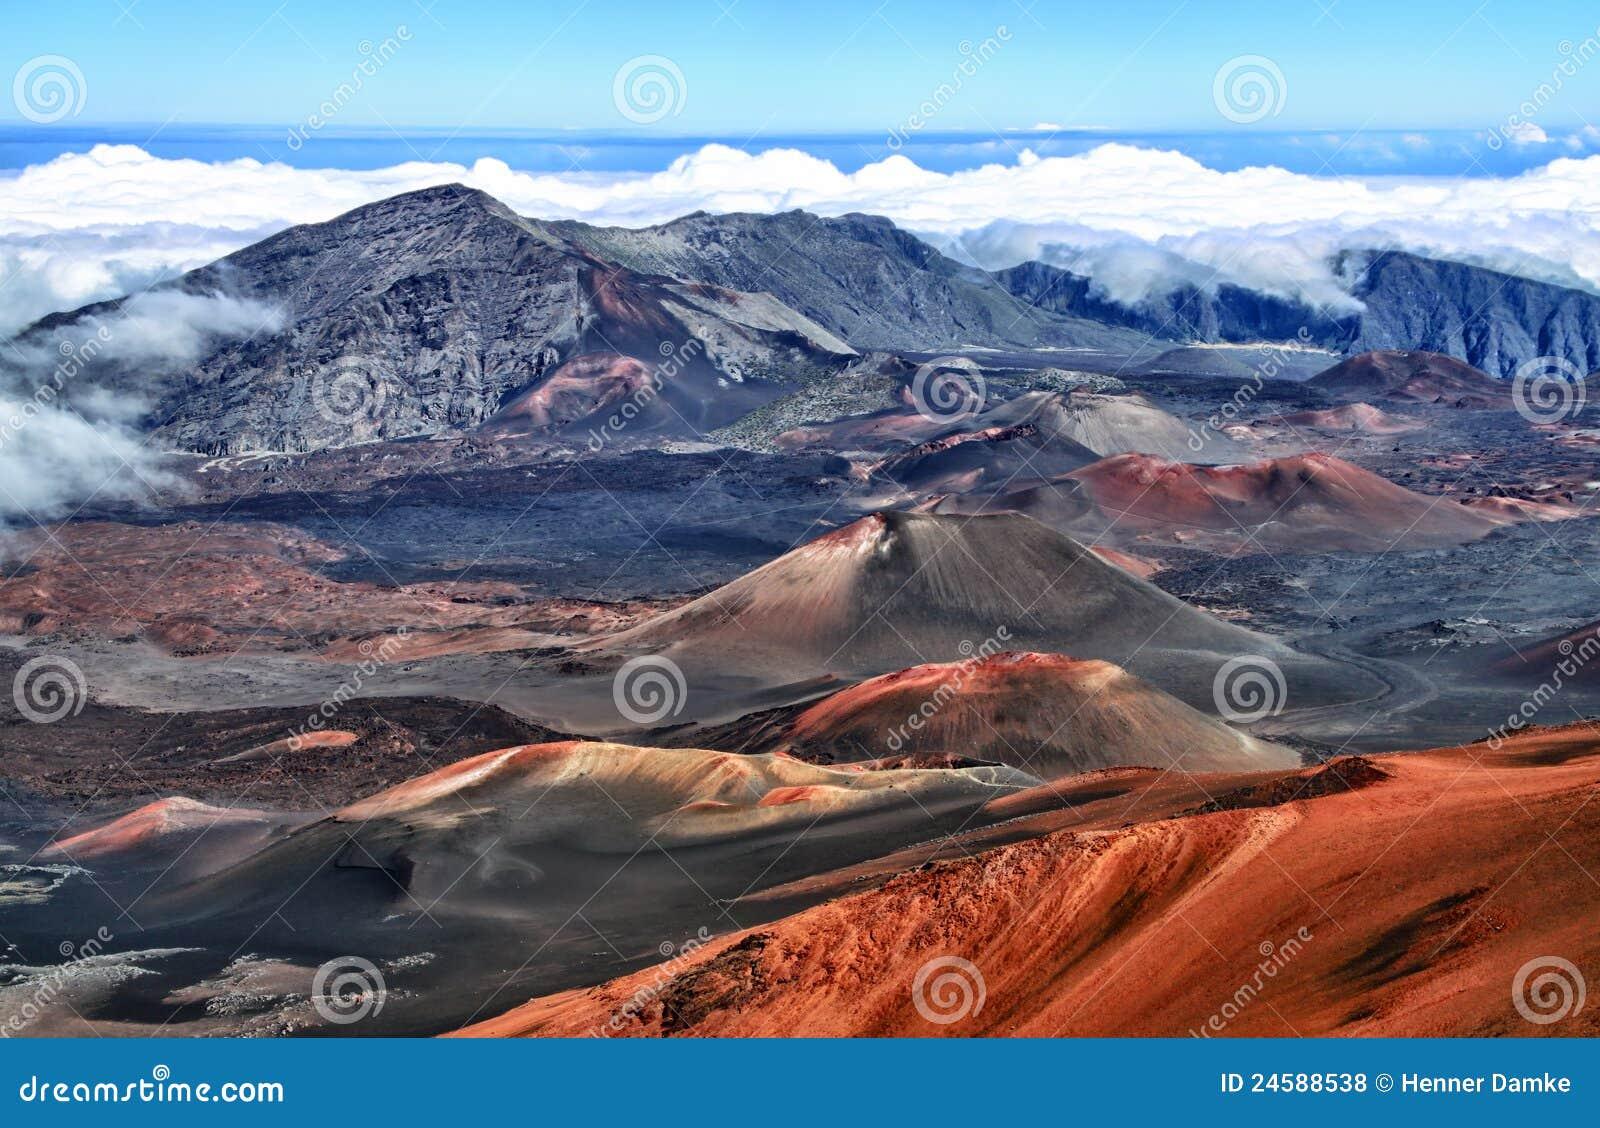 Volcan Haleakala, Hawaï (Maui)